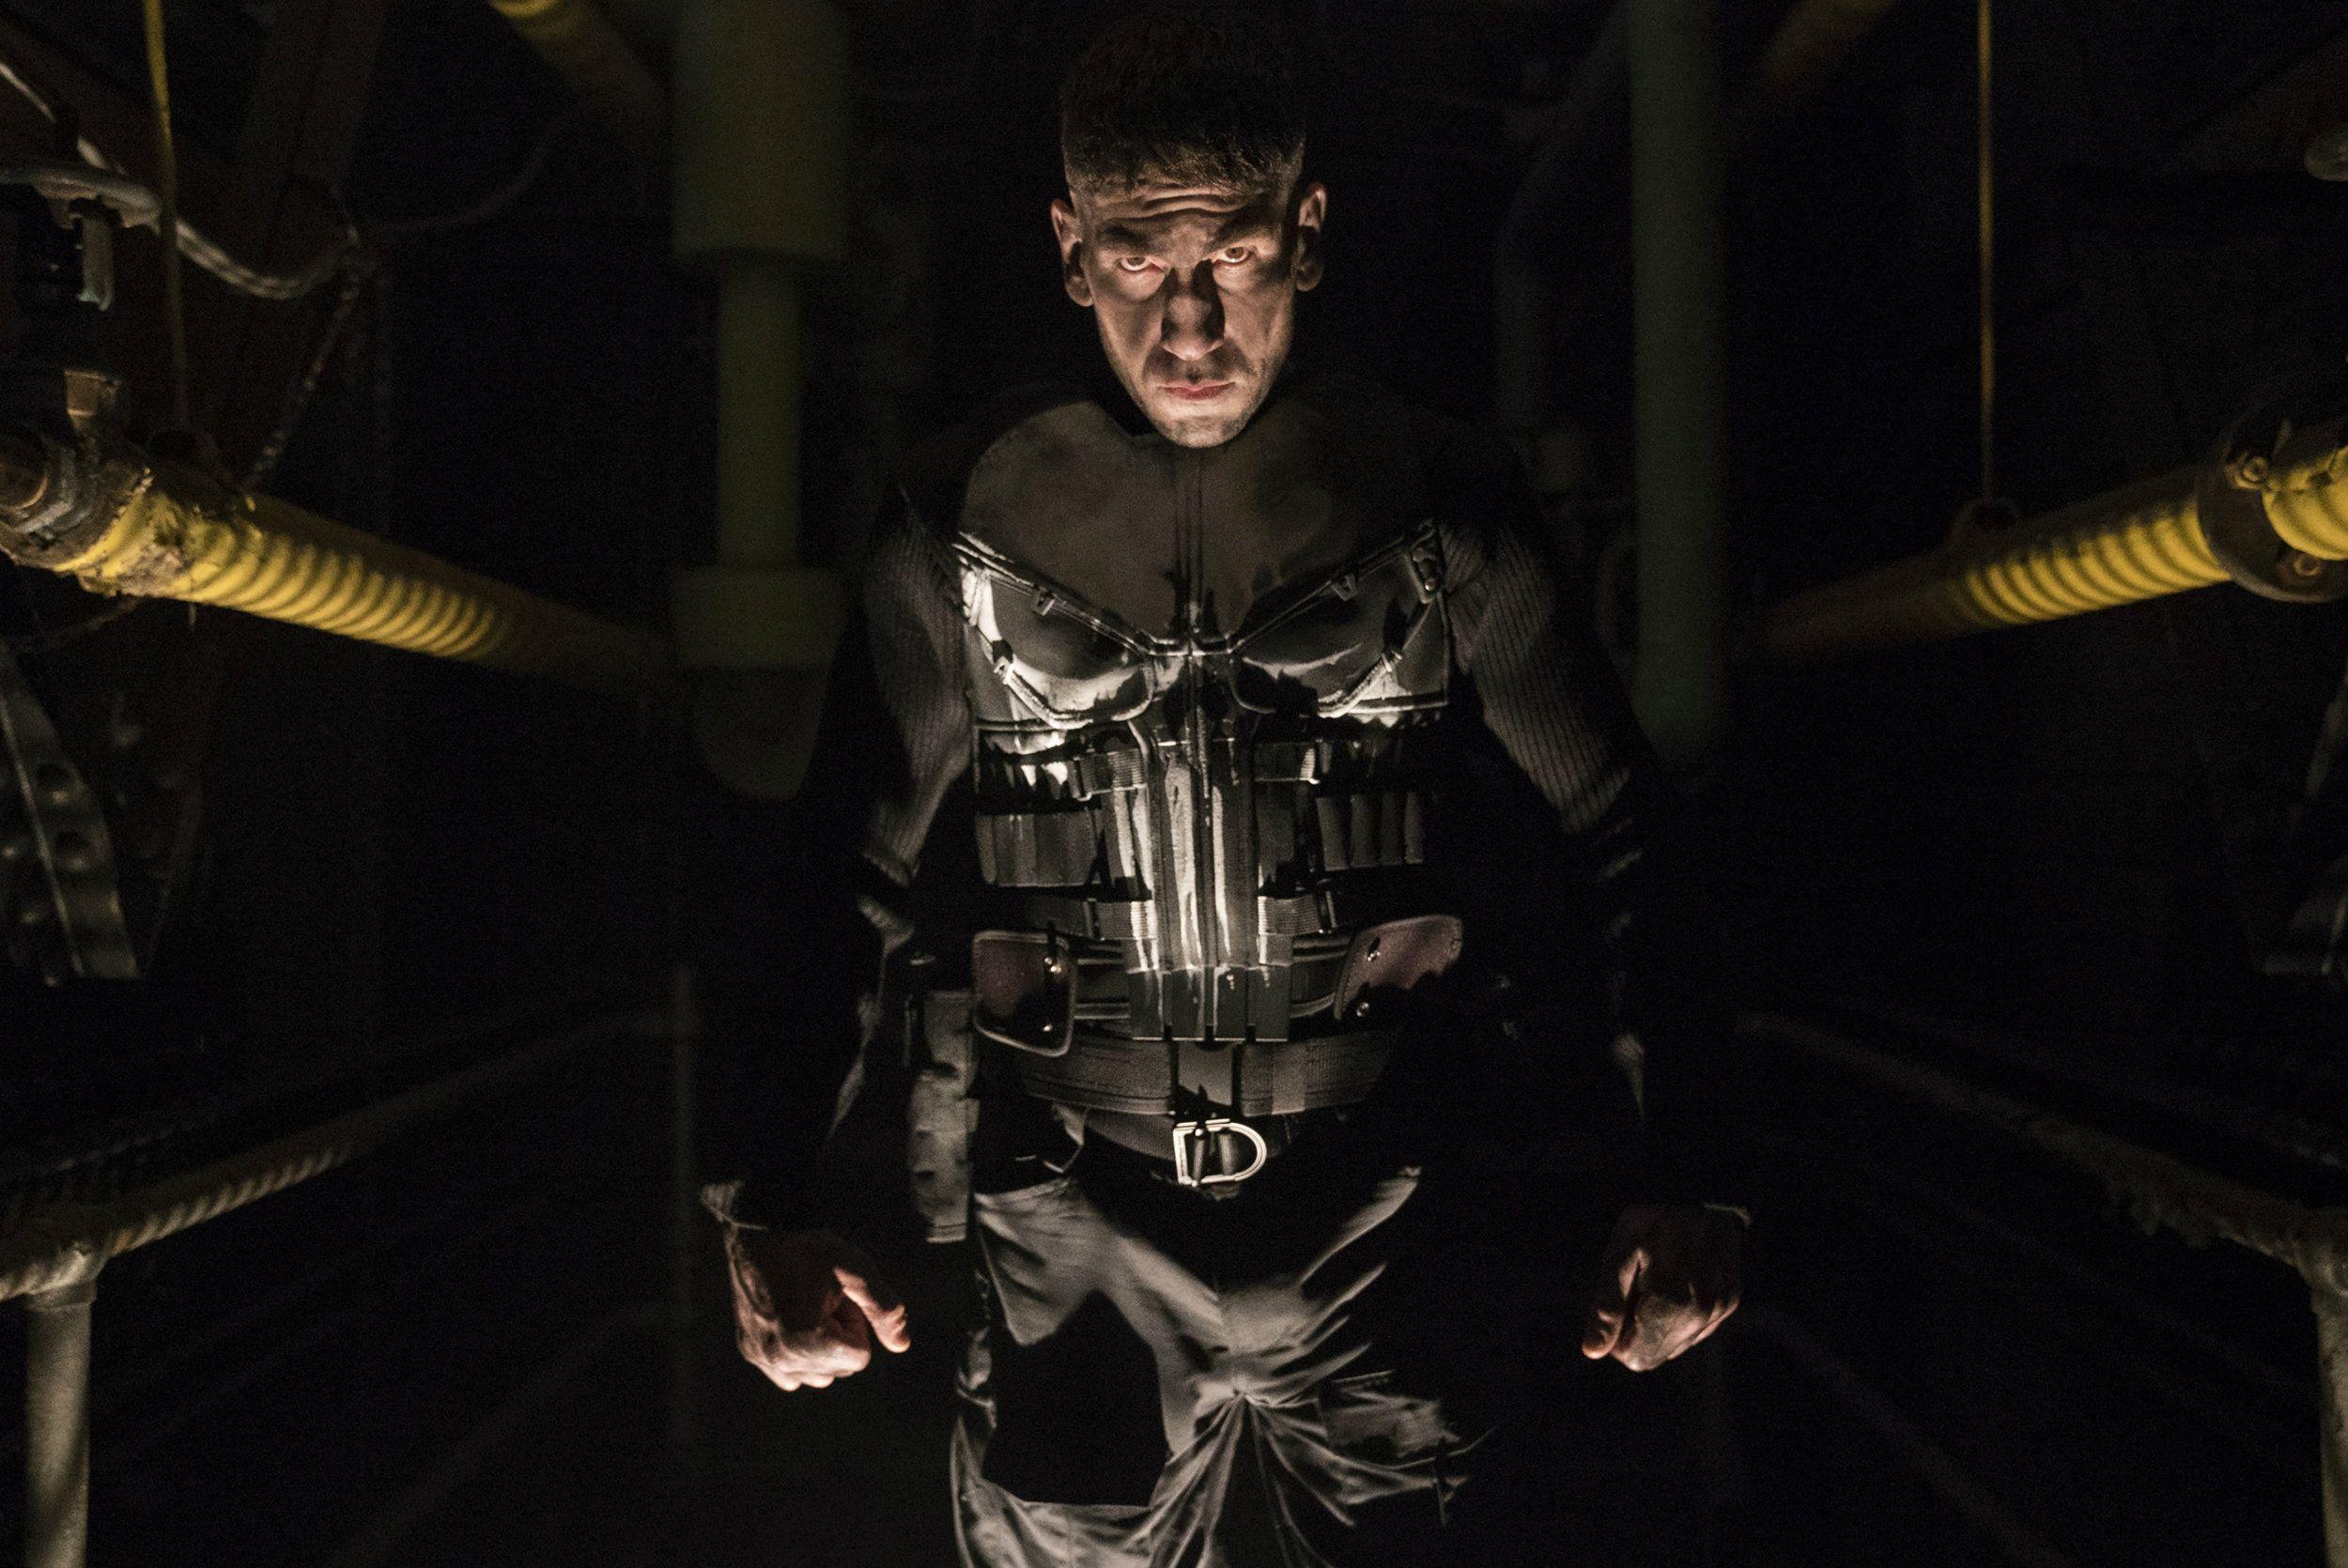 The-Punisher-TV-Show-Jon-Bernthal.jpg?cs